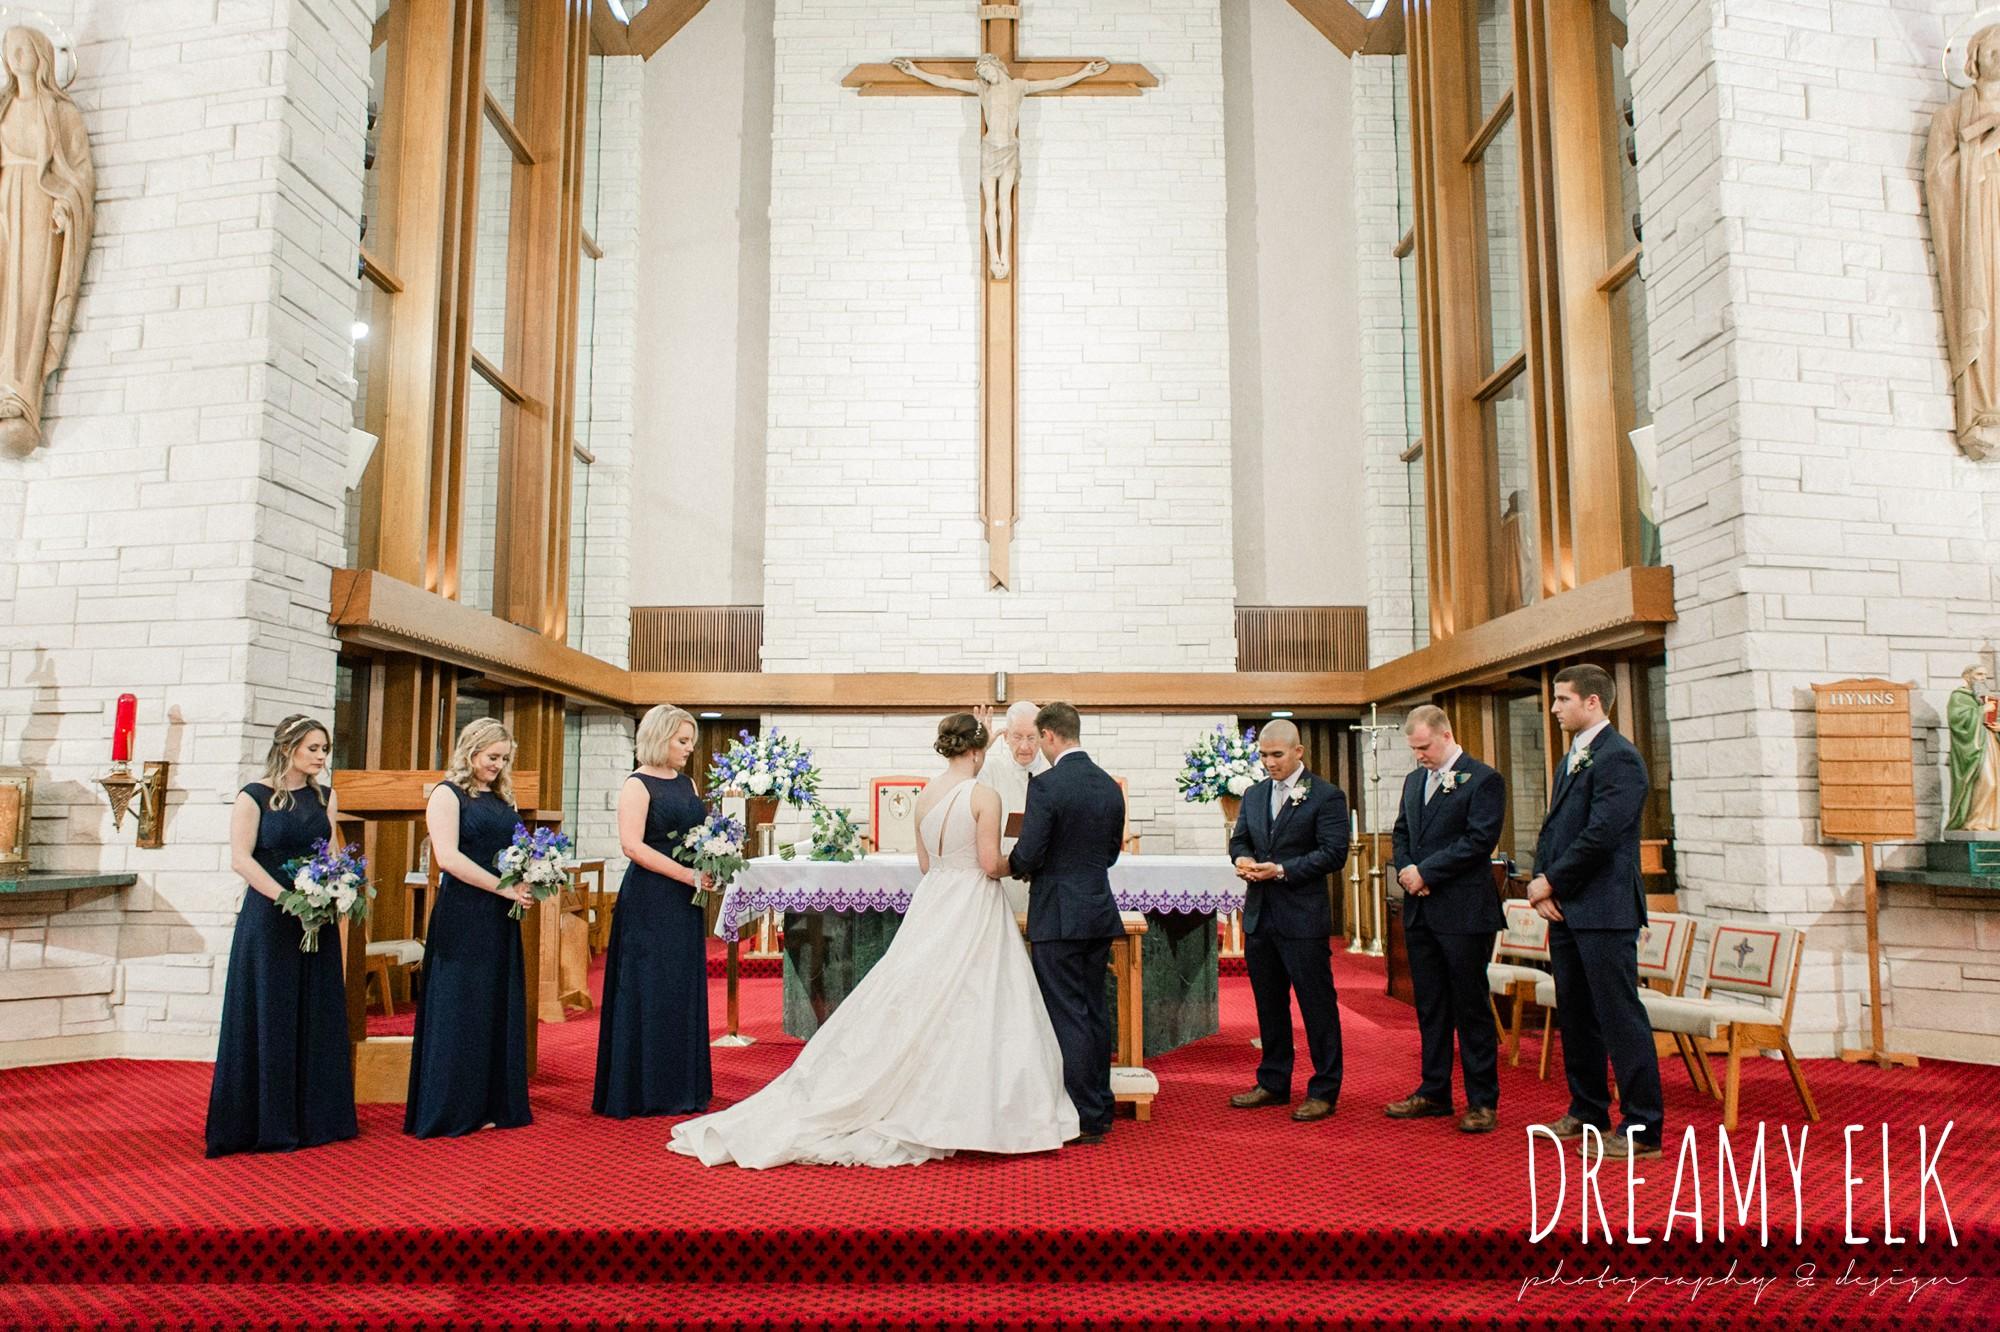 bride and groom, catholic wedding ceremony church, modern wedding dress ballgown, spring wedding, the astin mansion, bryan, texas, spring wedding, dreamy elk photography and design